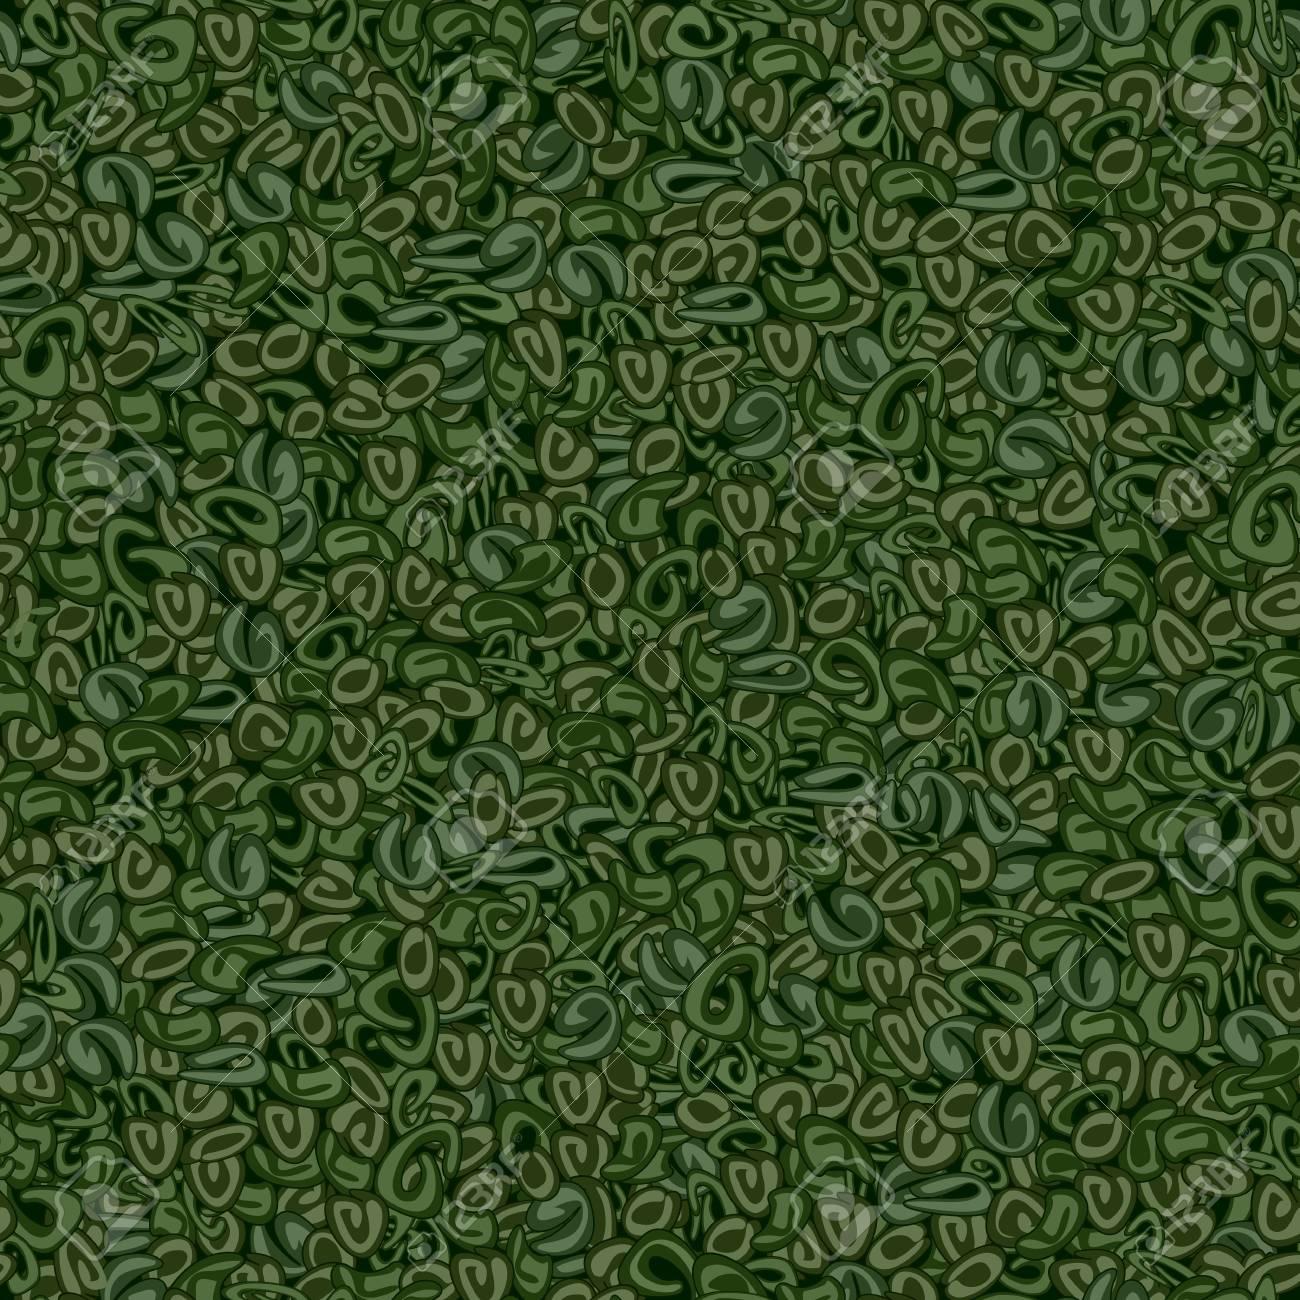 Seamless texture of Gunpowder green tea on a dark green background - 94662525